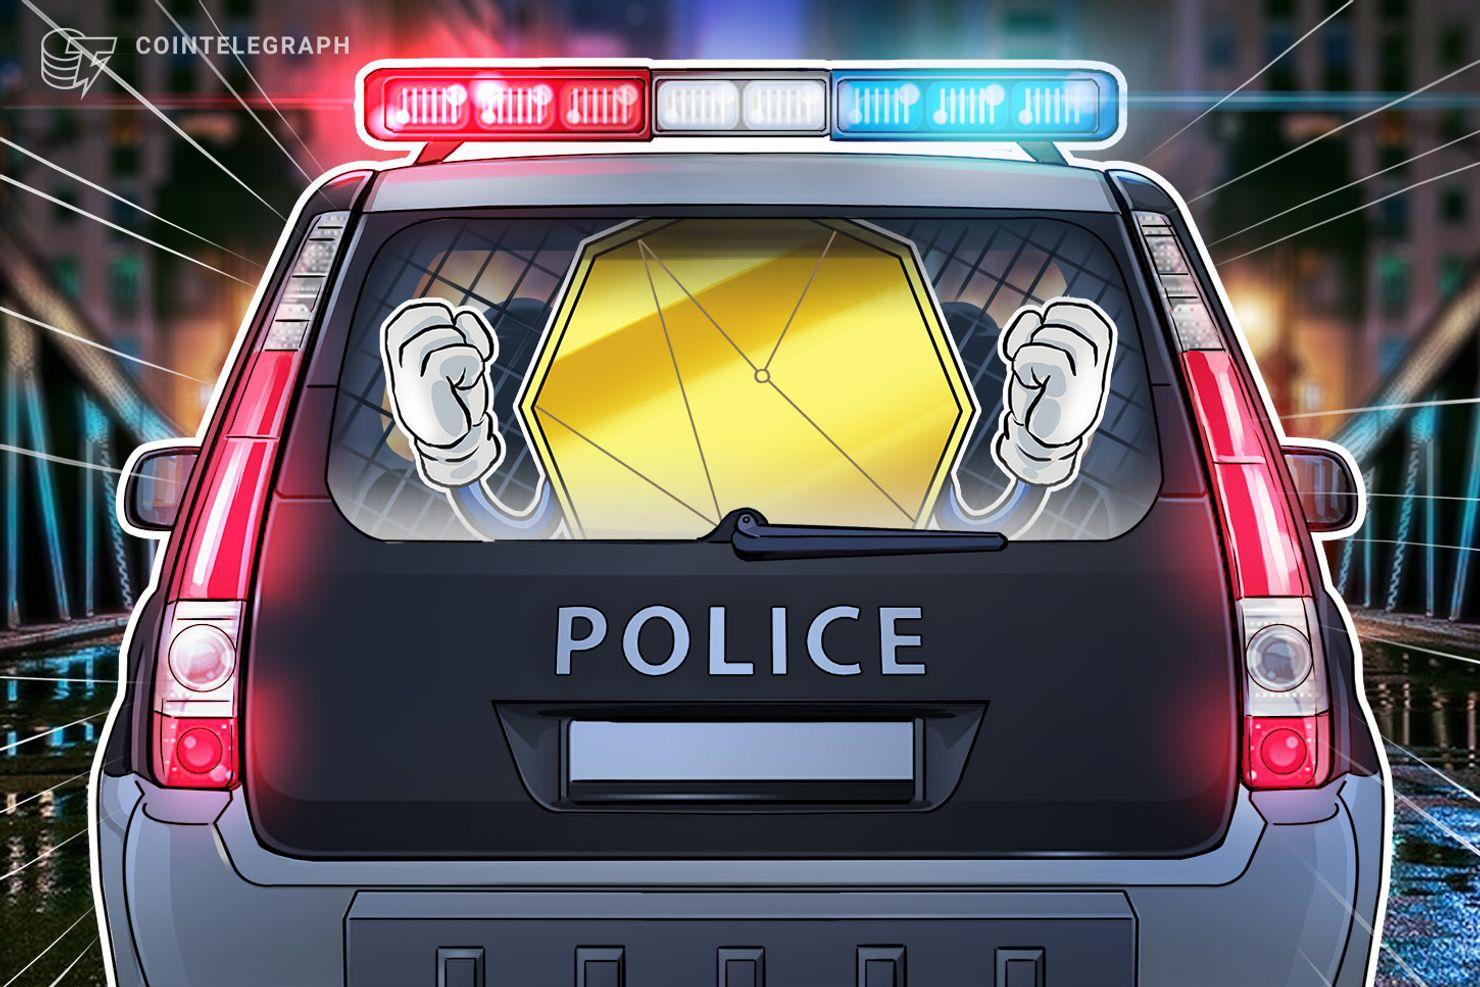 Roubo de criptos na Espanha: advogado dá detalhes sobre a primeira denúncia do país investigada pela Europol